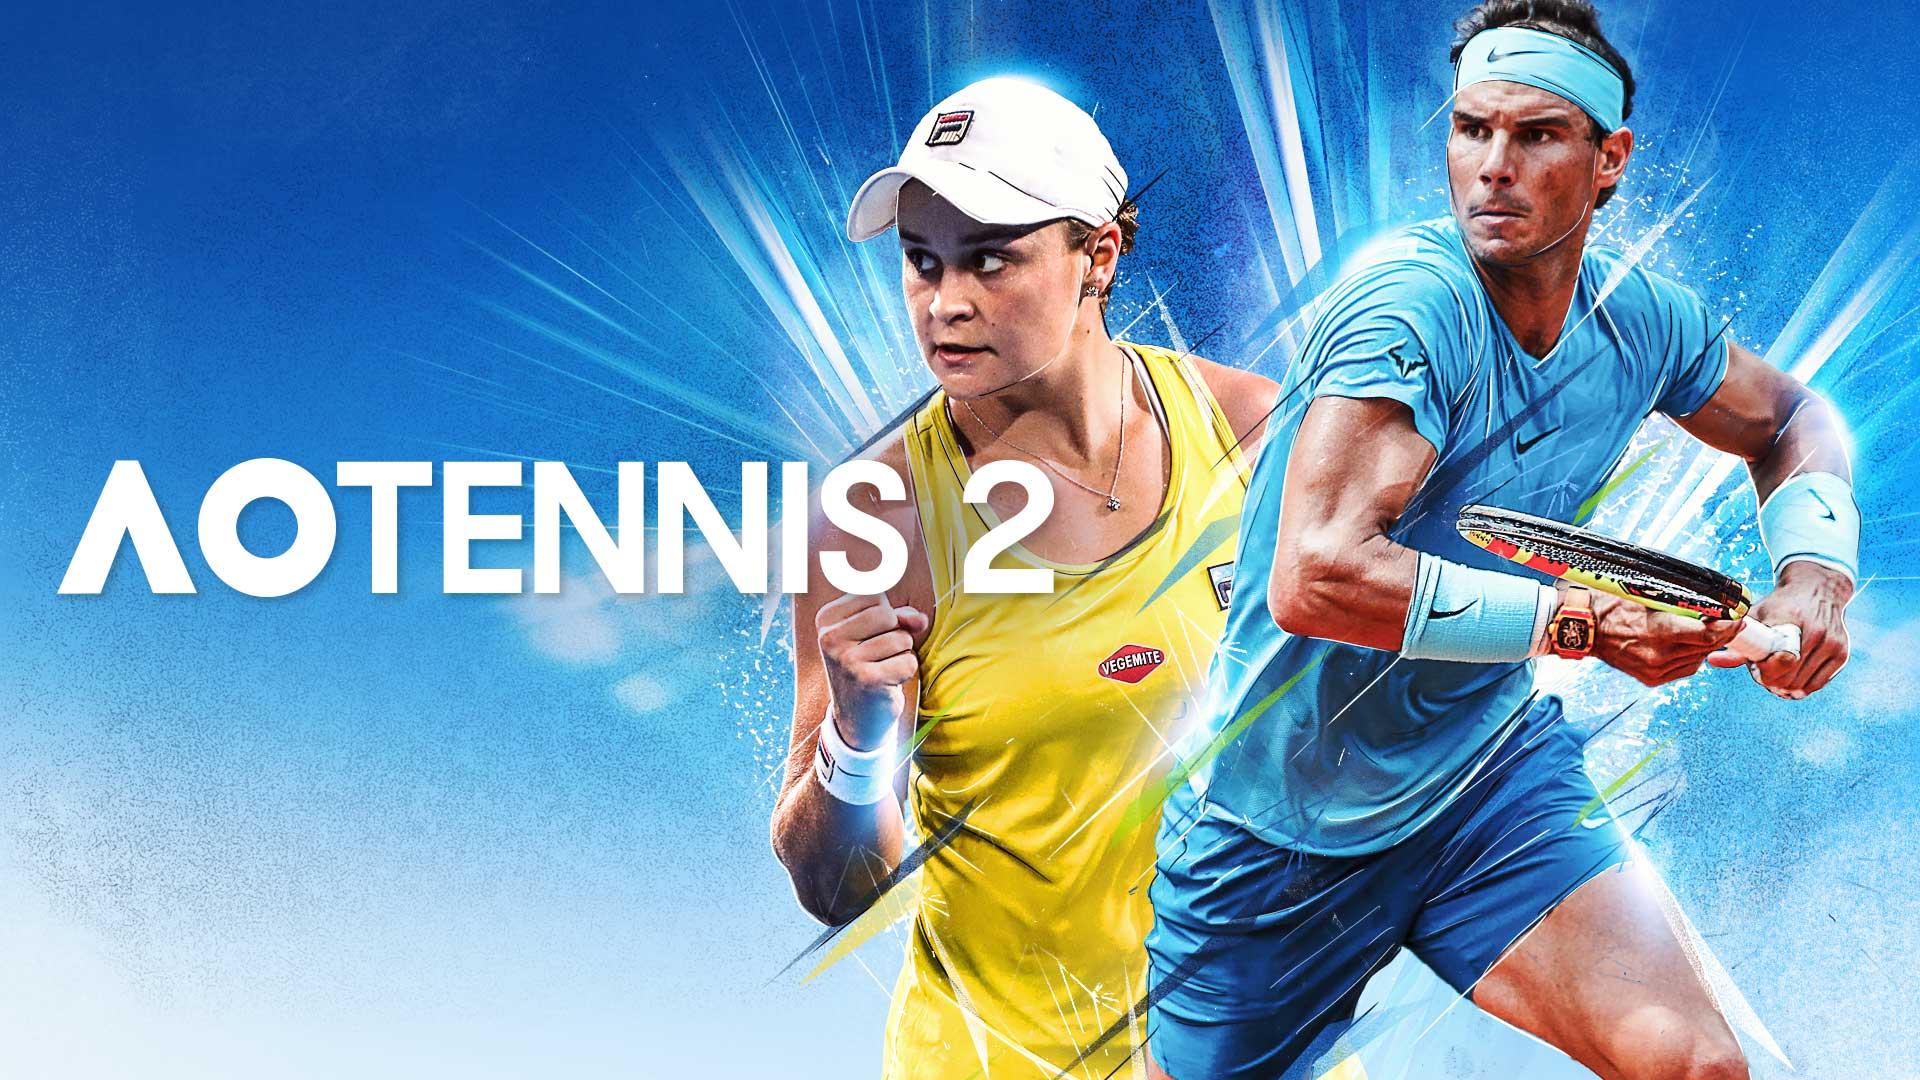 O novo trailer do AO Tennis 2 apresenta seu editor de conteúdo, o AO Tennis ...